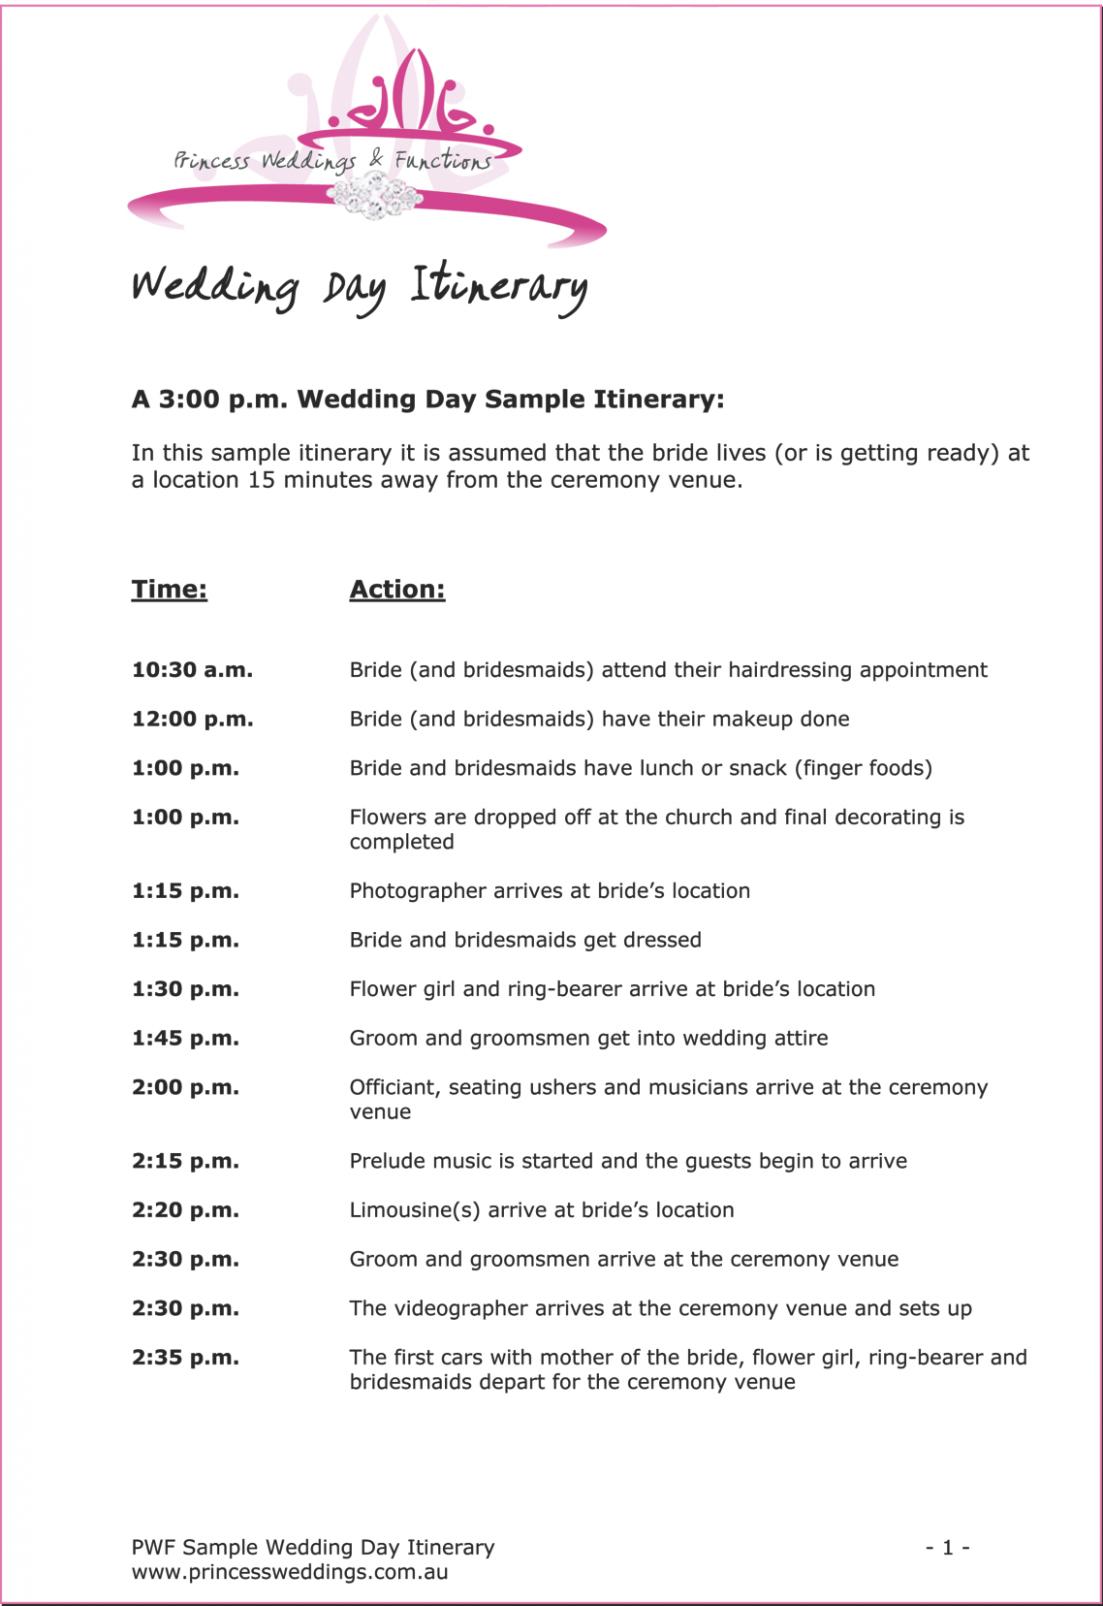 Wedding Itinerary Template Lisamaurodesign WeddingCeremony ItineraryBridalParties